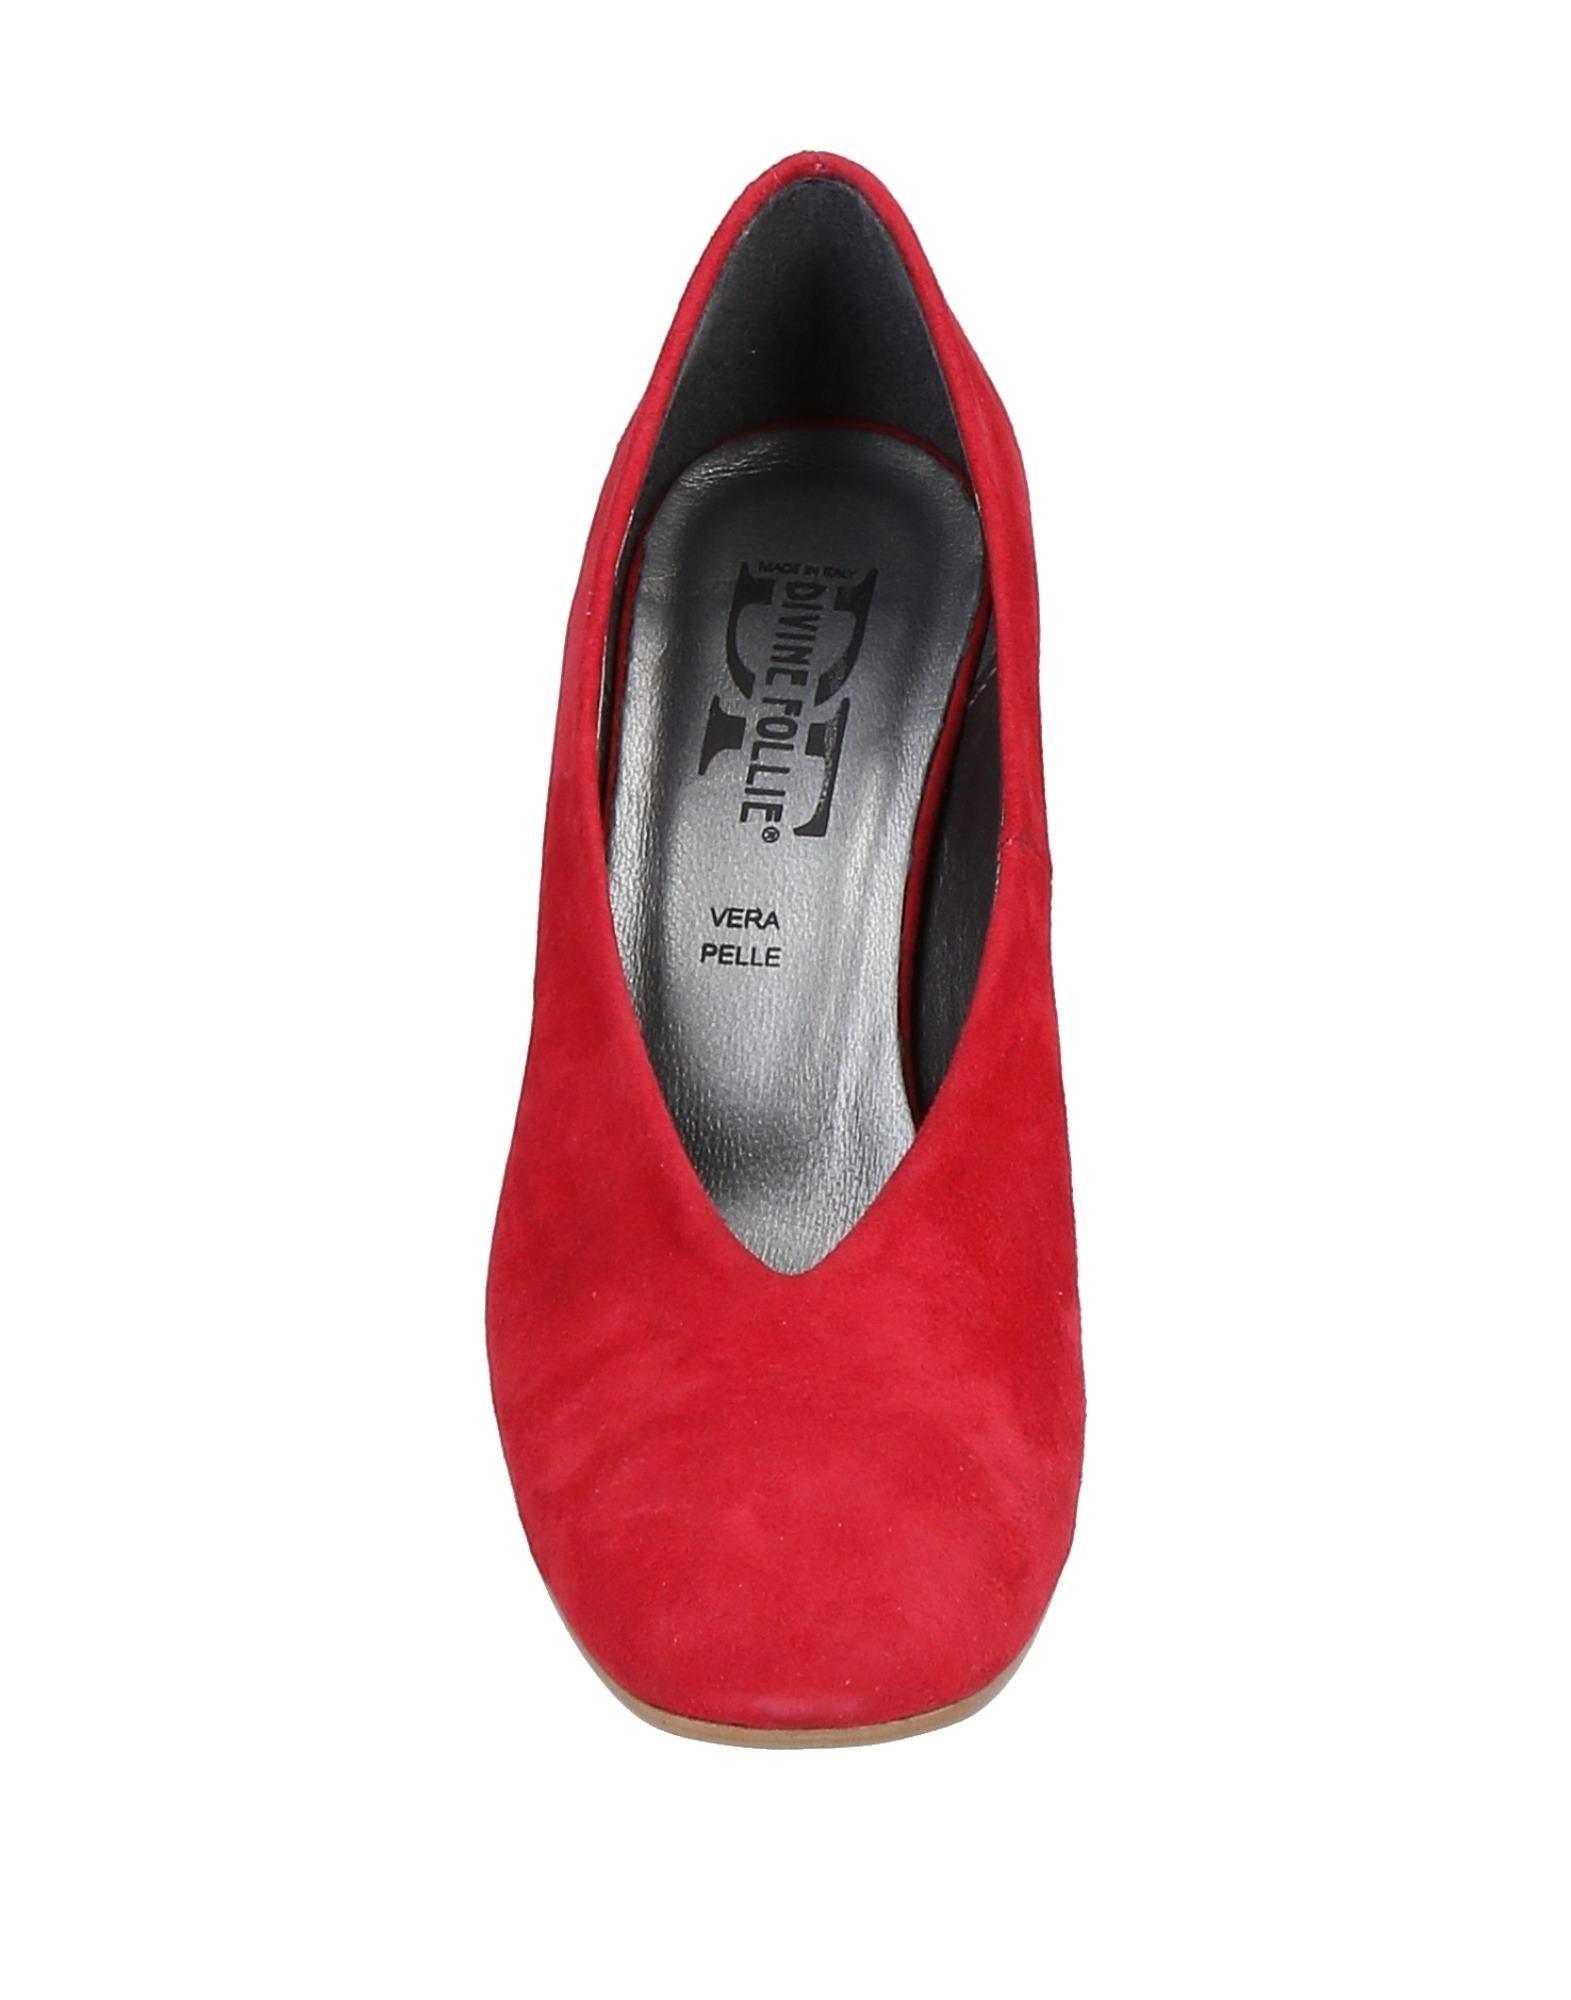 Divine 11562881KI Follie Pumps Damen  11562881KI Divine Gute Qualität beliebte Schuhe 57e607